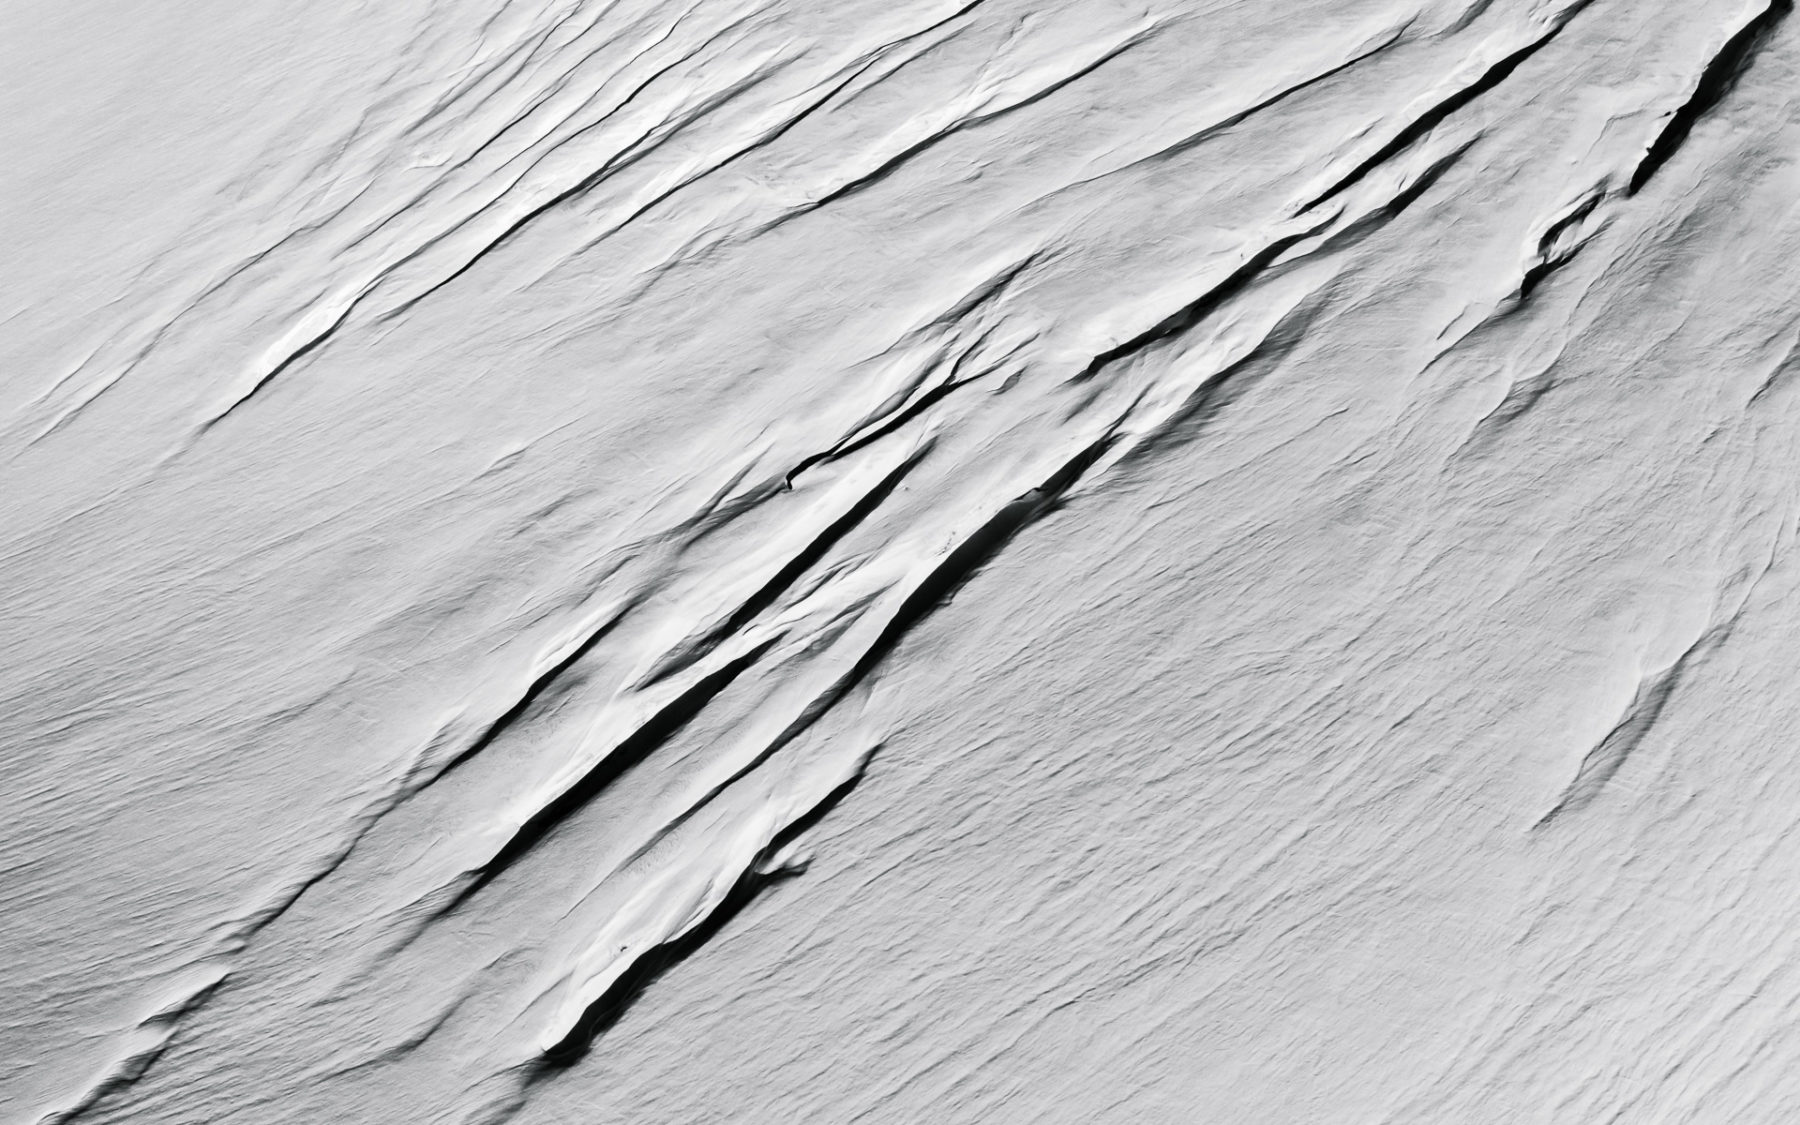 nls 2001 norway iceland portraits of glaciers 04